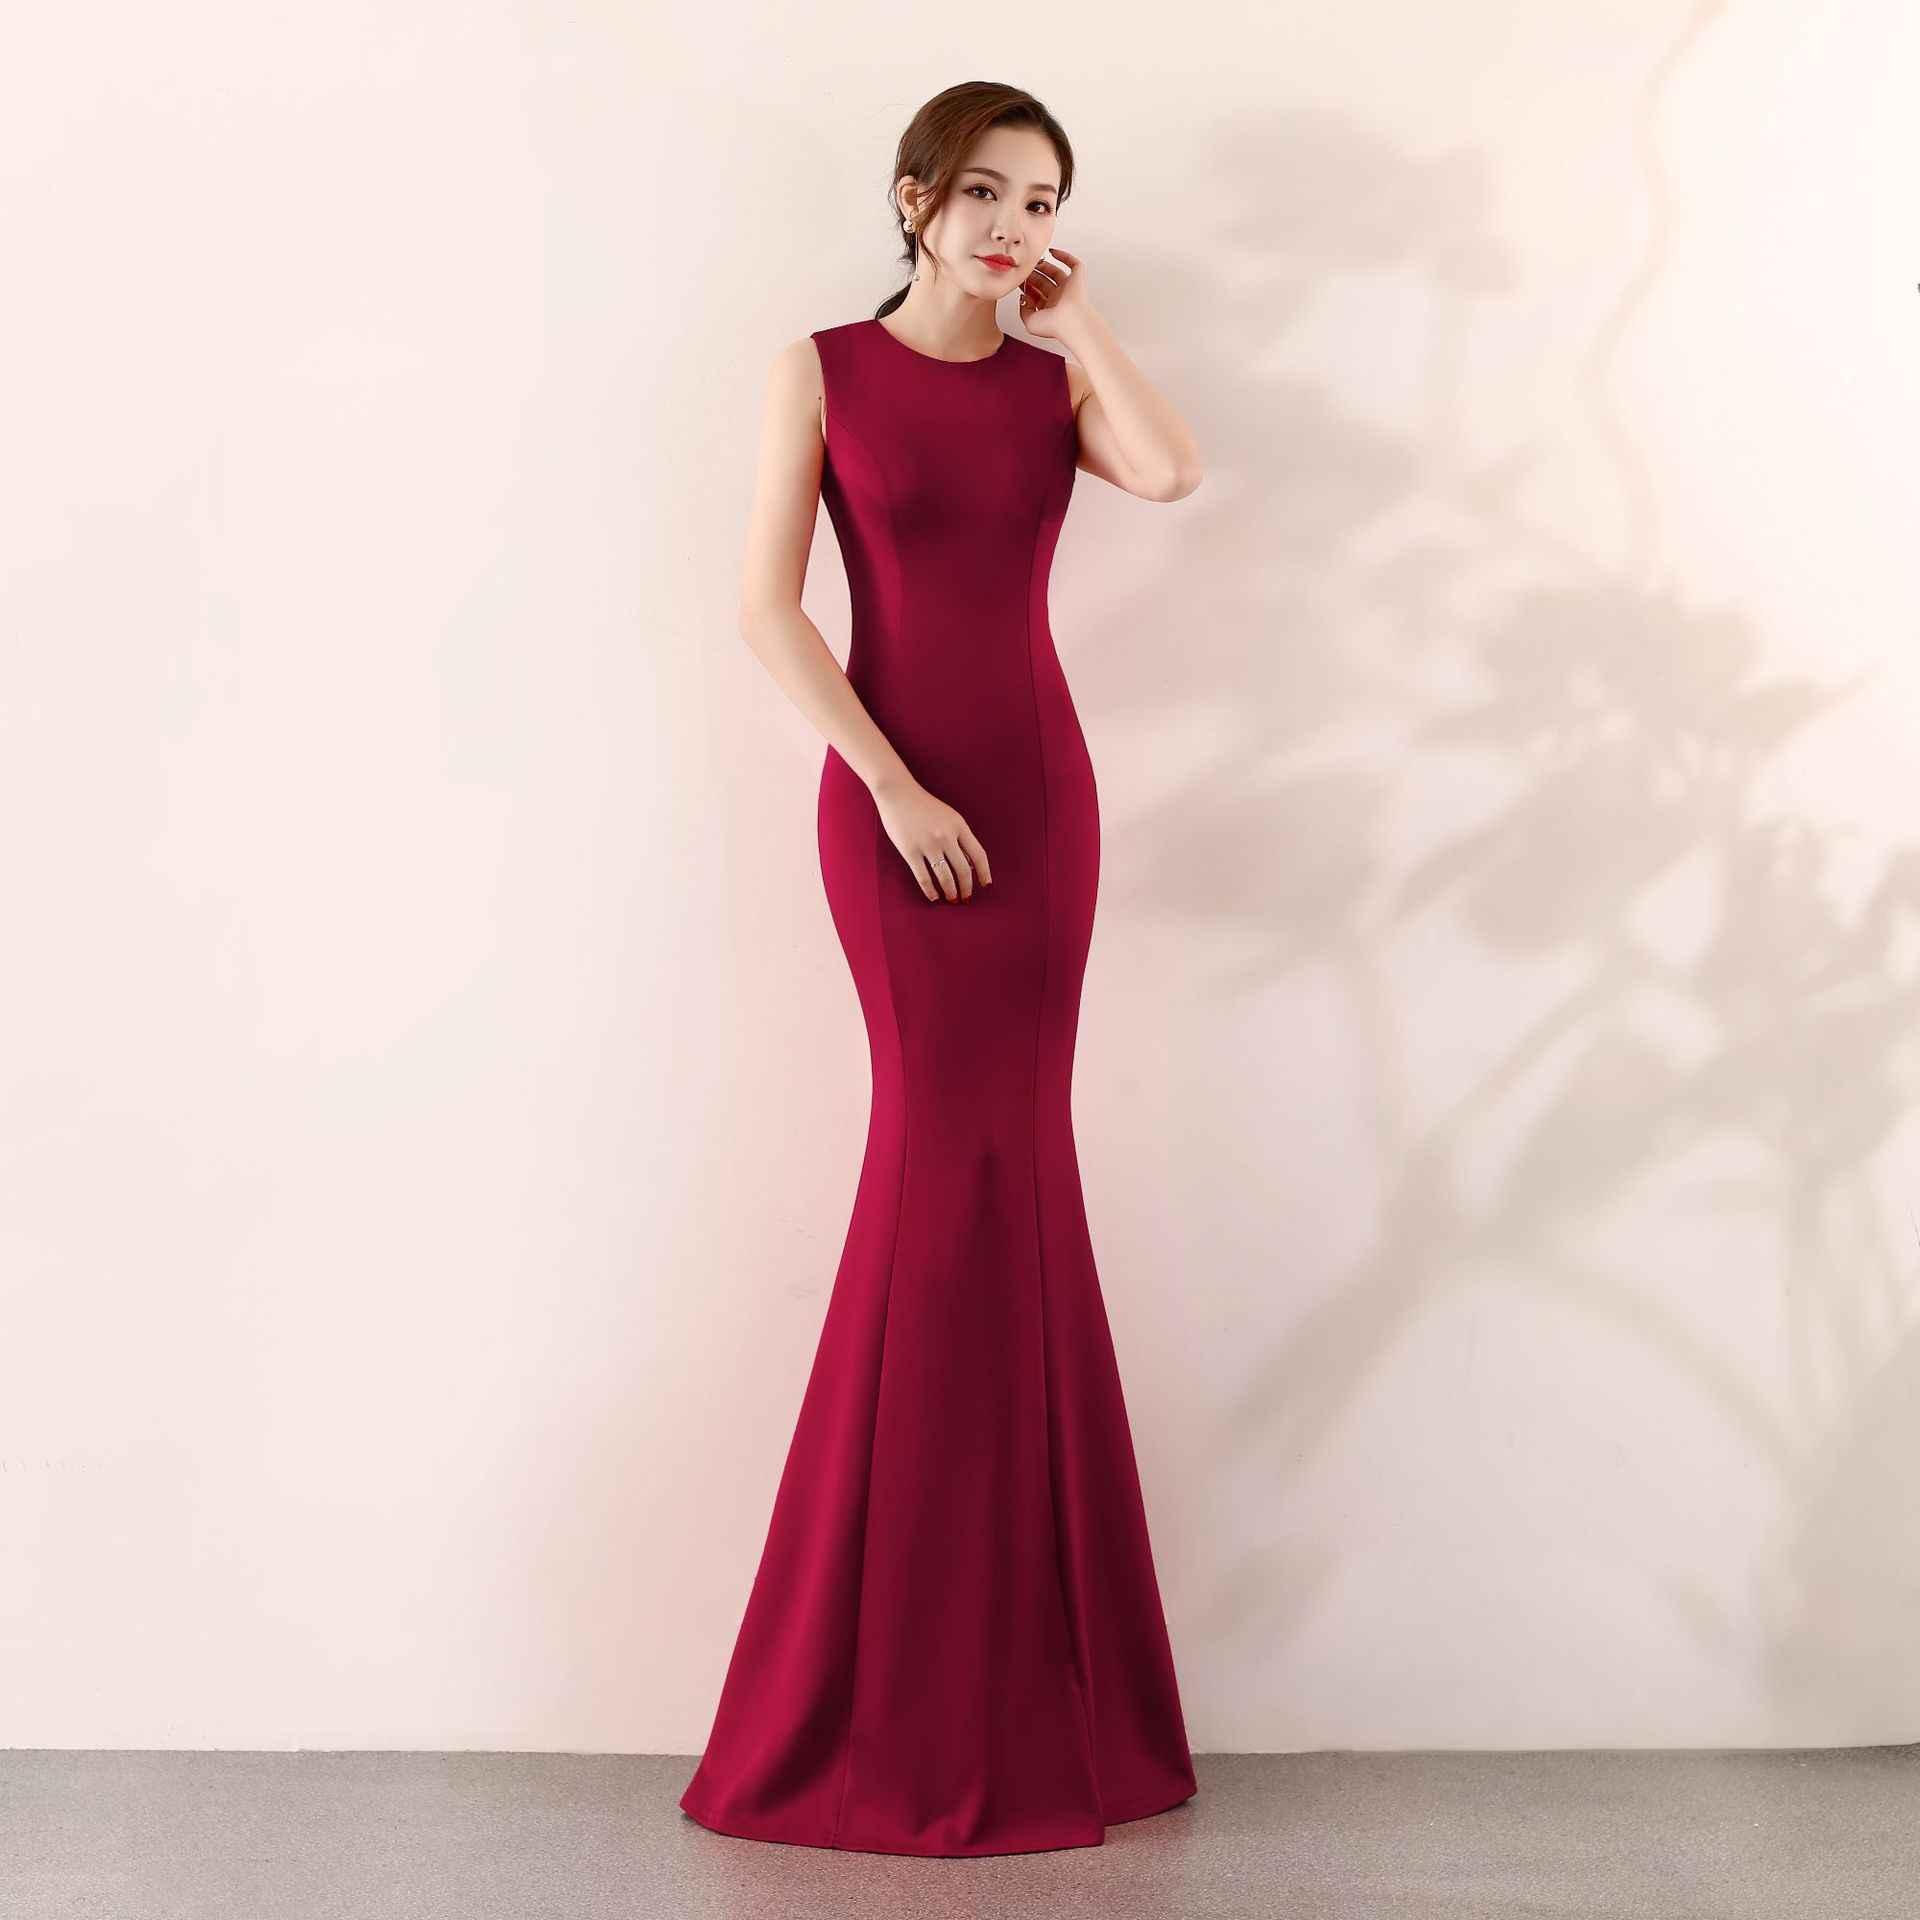 ROOD 2019 Effen Bruid Bruiloft Vrouwelijke Jurk Elegant Mermaid Avond Party Dress Rok Slanke Mouwloze Sexy Cheongsam Maat S-XL